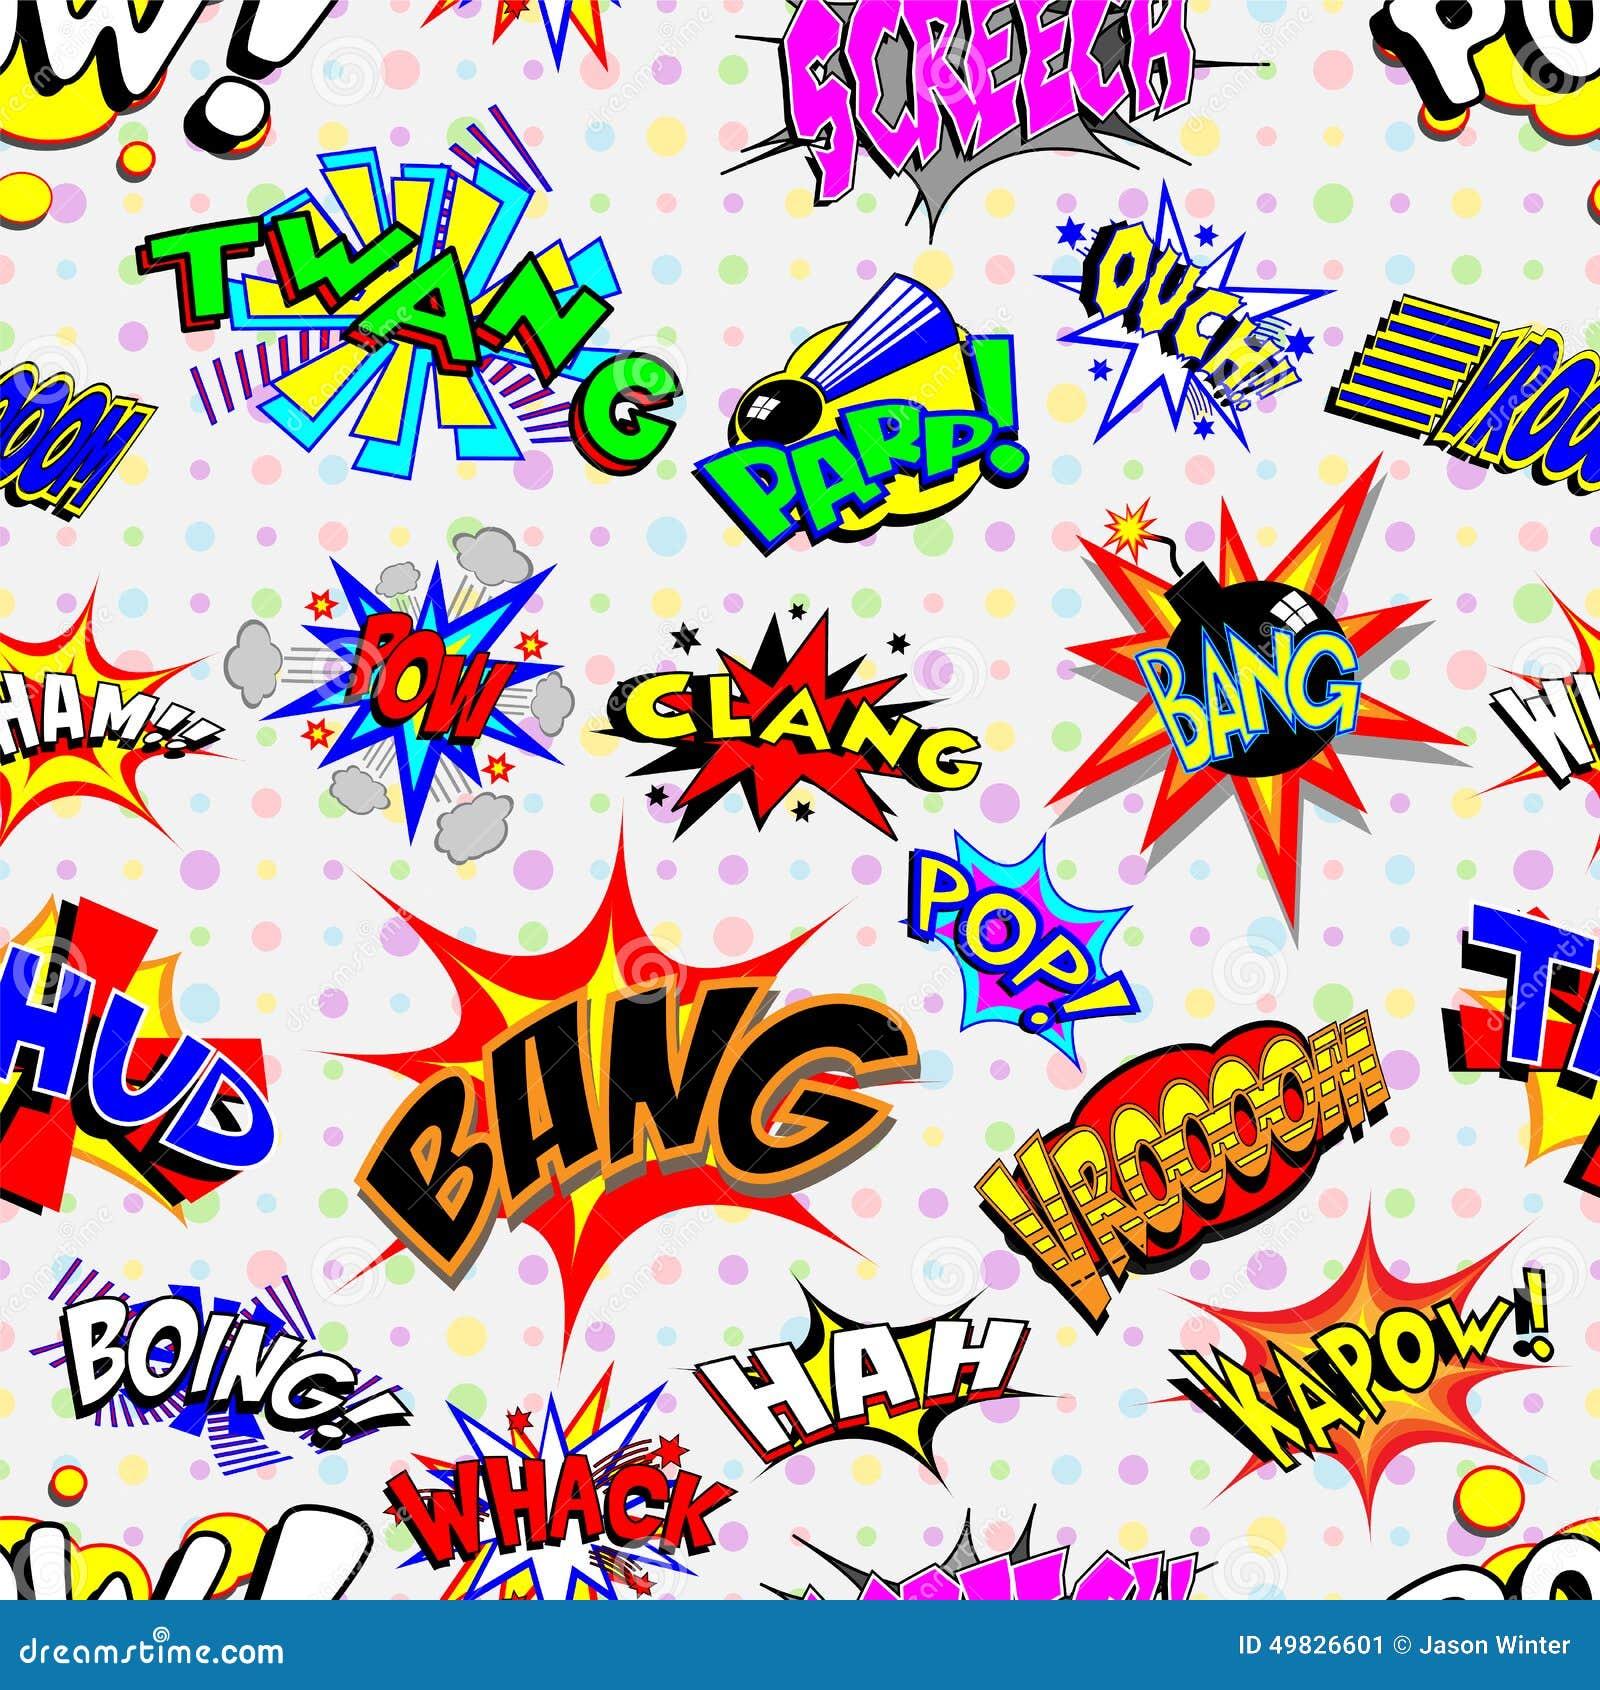 cartoon explosions background stock vector illustration star wars rebel logo vector star wars free vector download